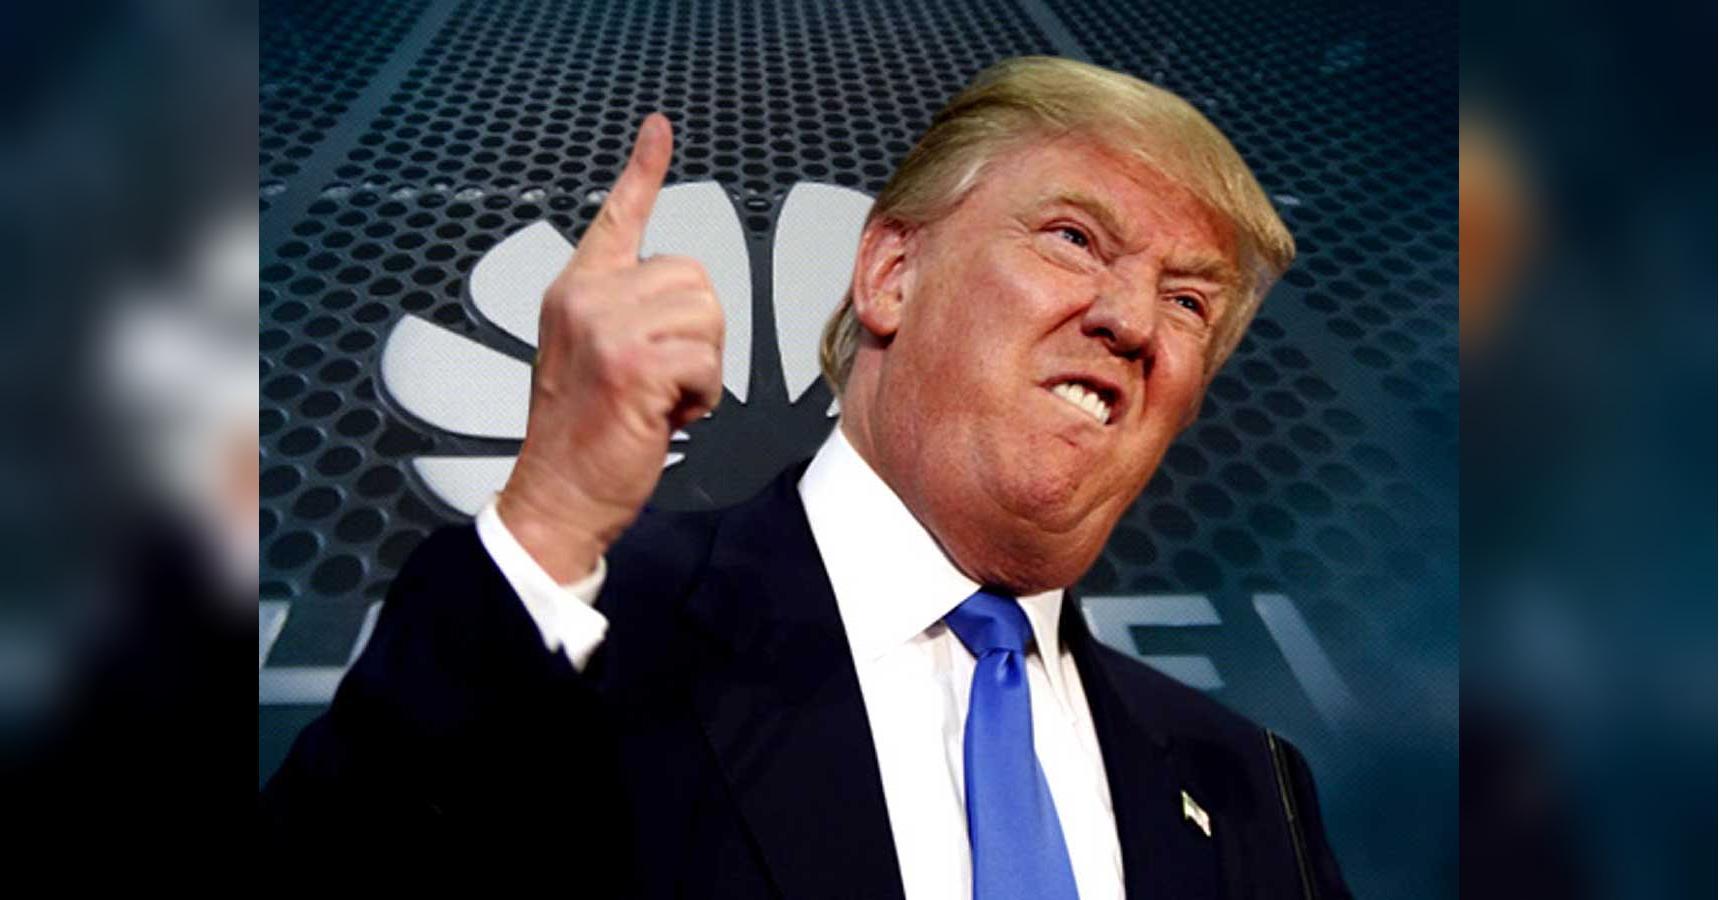 Trump Campaign Site 'Defaced' In Apparent Hack